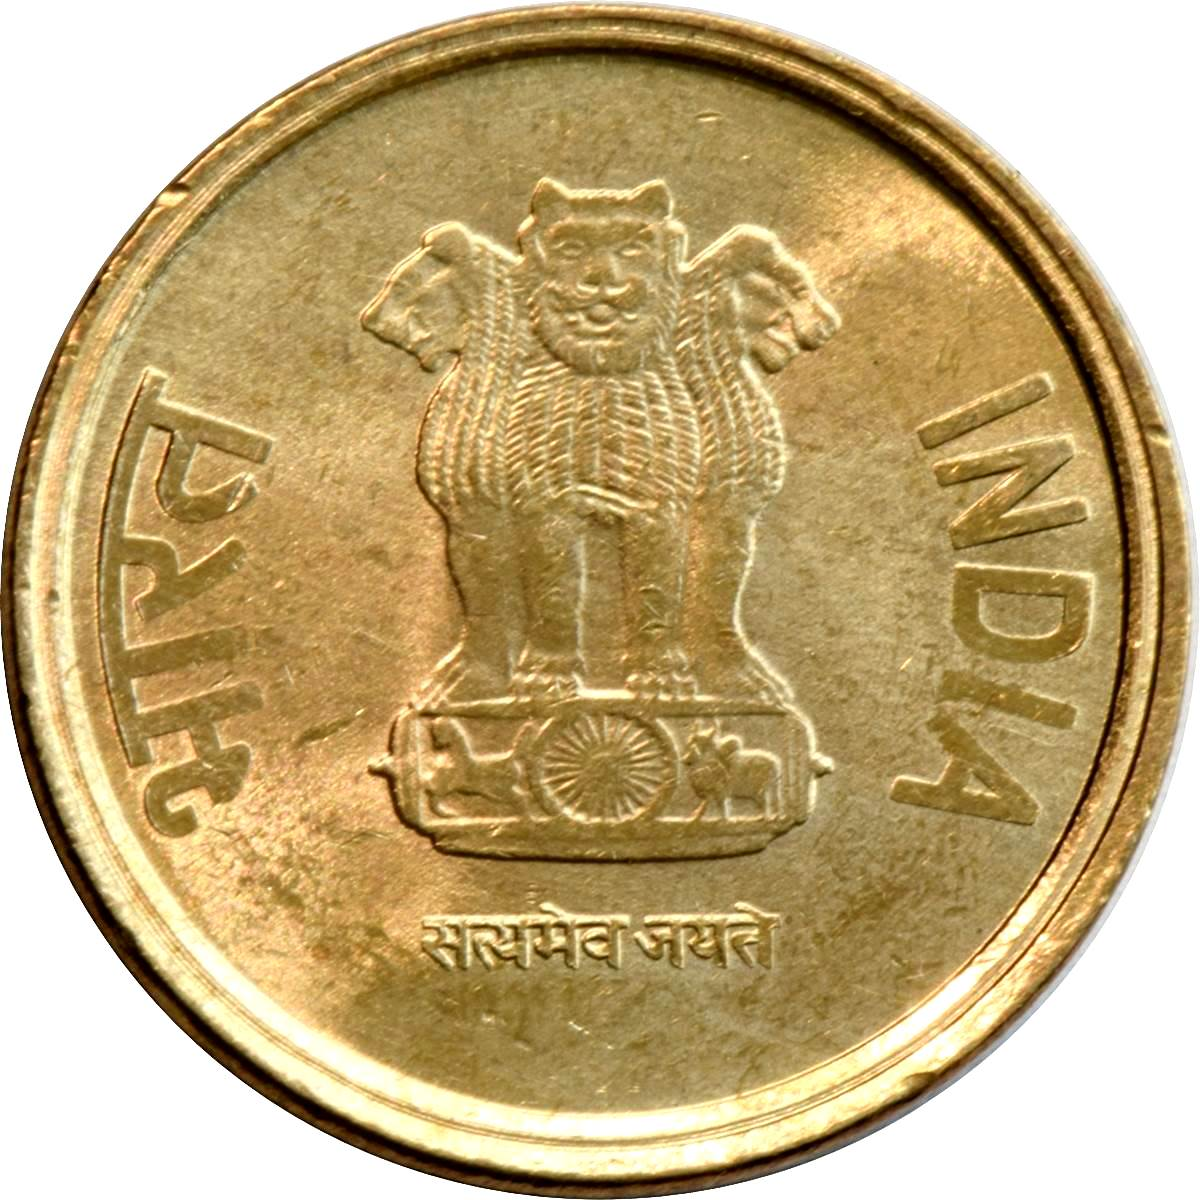 2011 India 5 Rupees ND 2002 P-88Aa Gandhi Unc